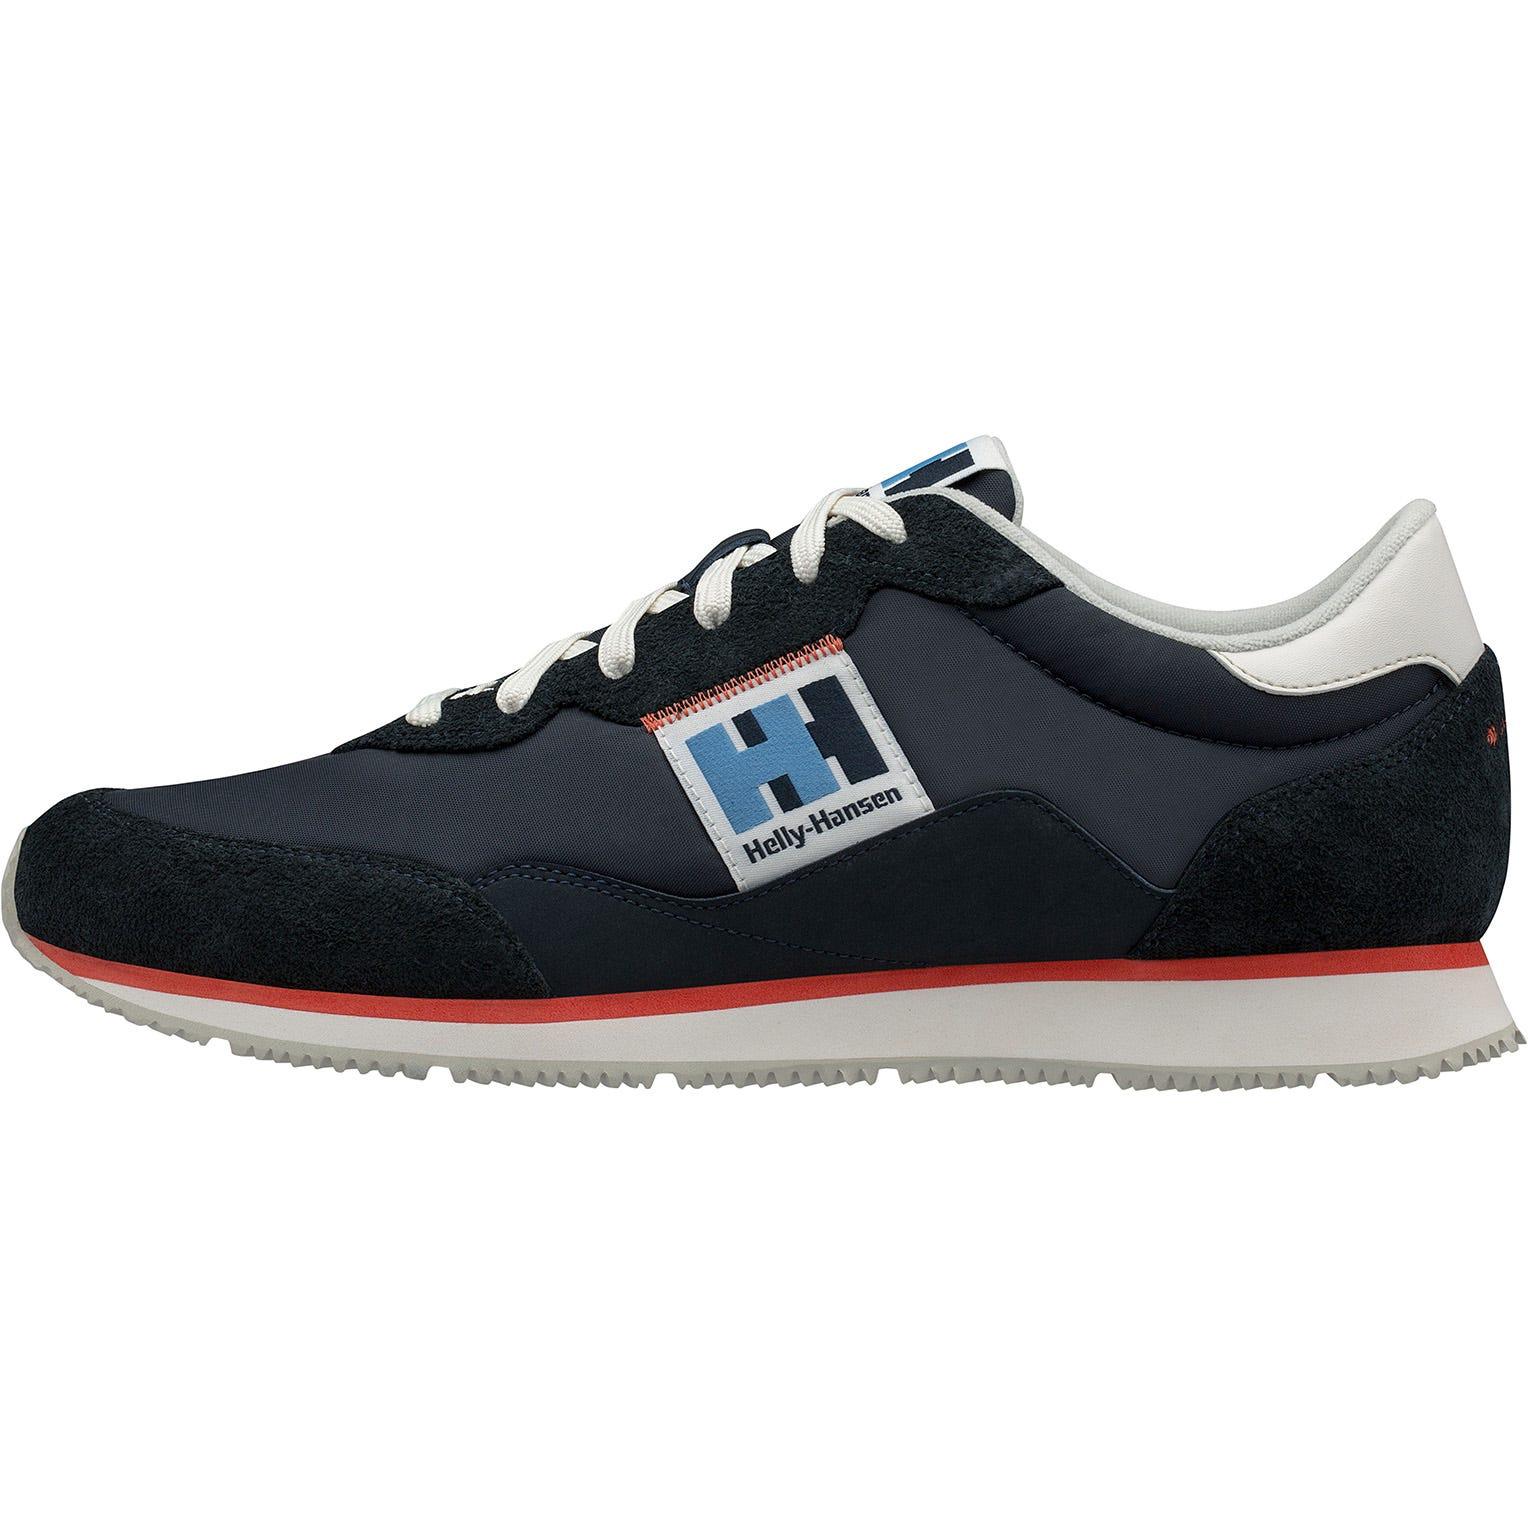 Helly Hansen Ripples Lowcut Sneaker Mens Navy 46.5/12